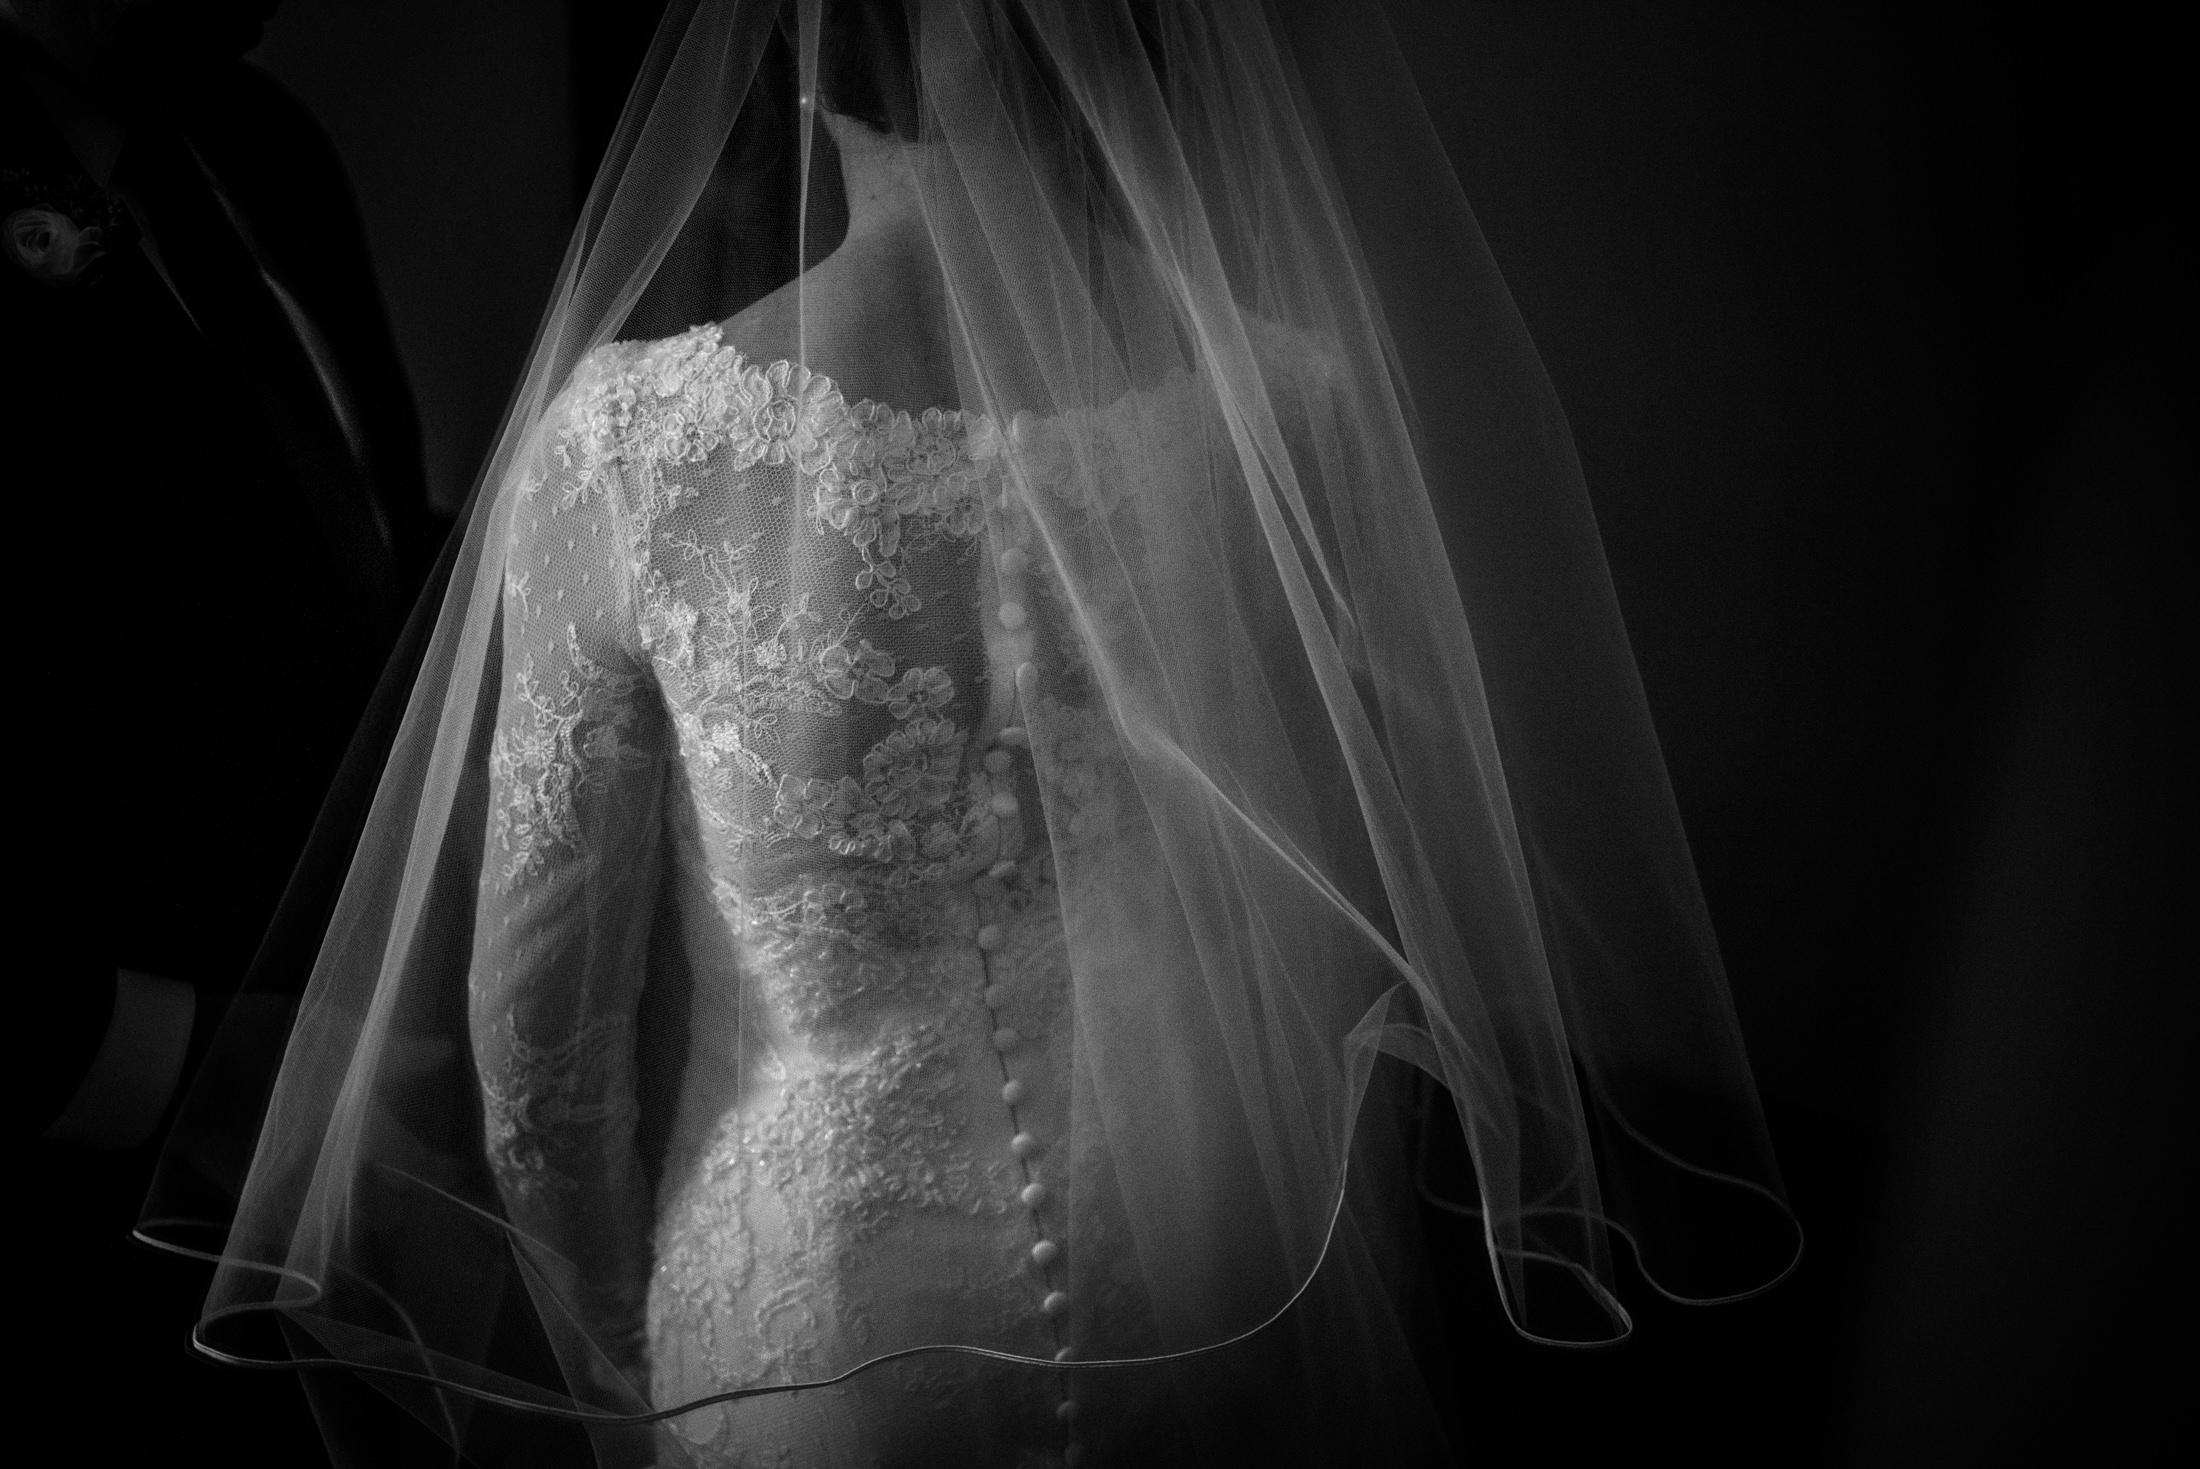 st-johns-creighton-omaha-wedding-photographer-jm-studios-0006.JPG